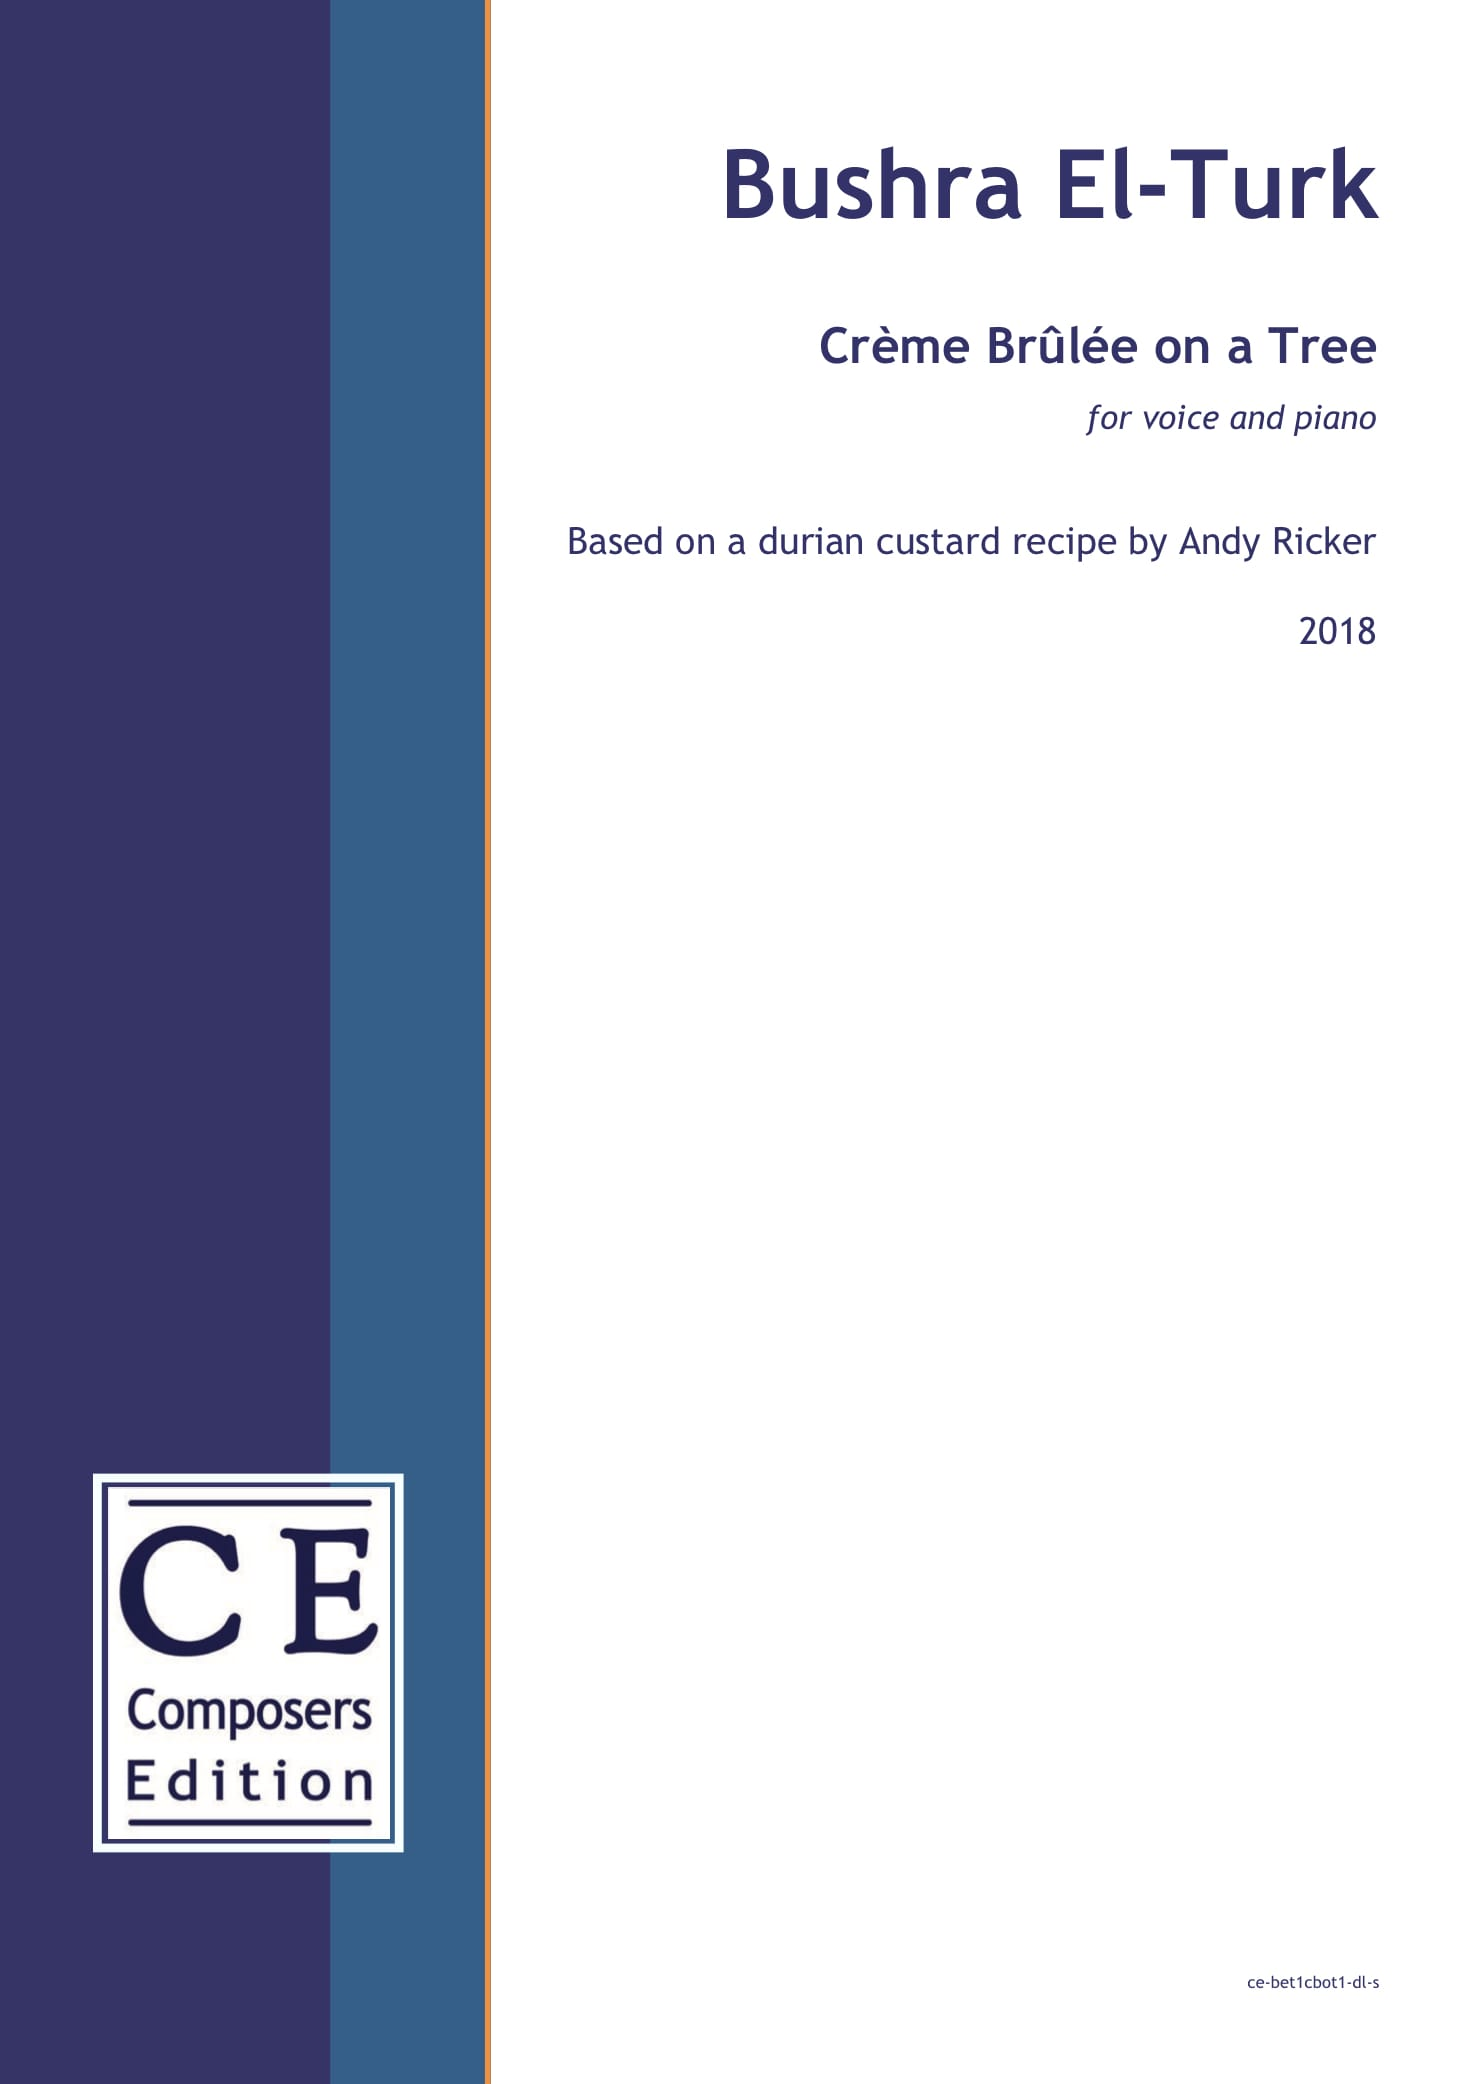 Bushra El-Turk: Crème Brûlée on a Tree for voice and piano